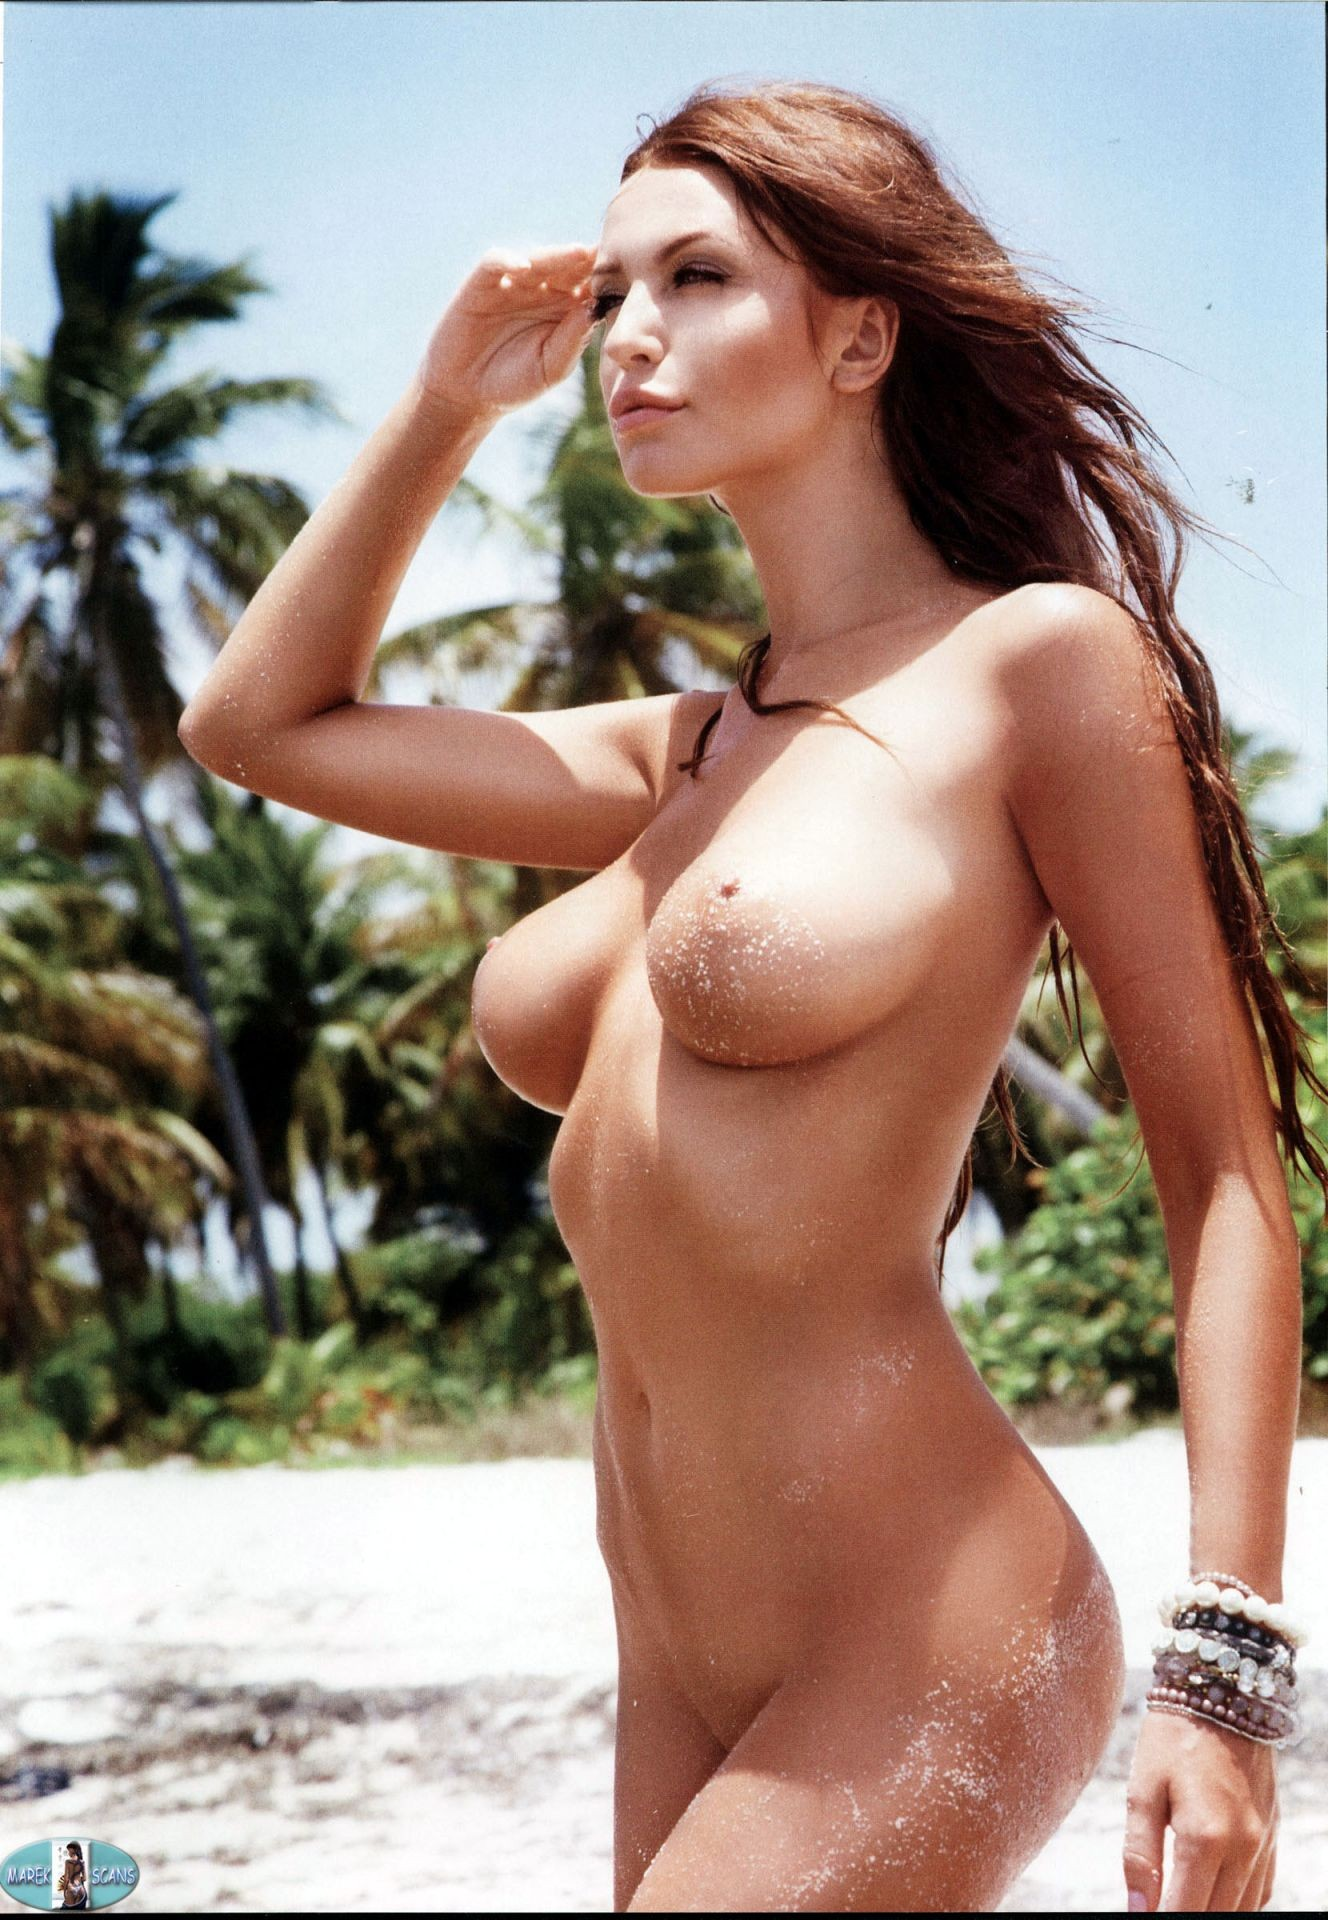 Monika hot nude lanka free school